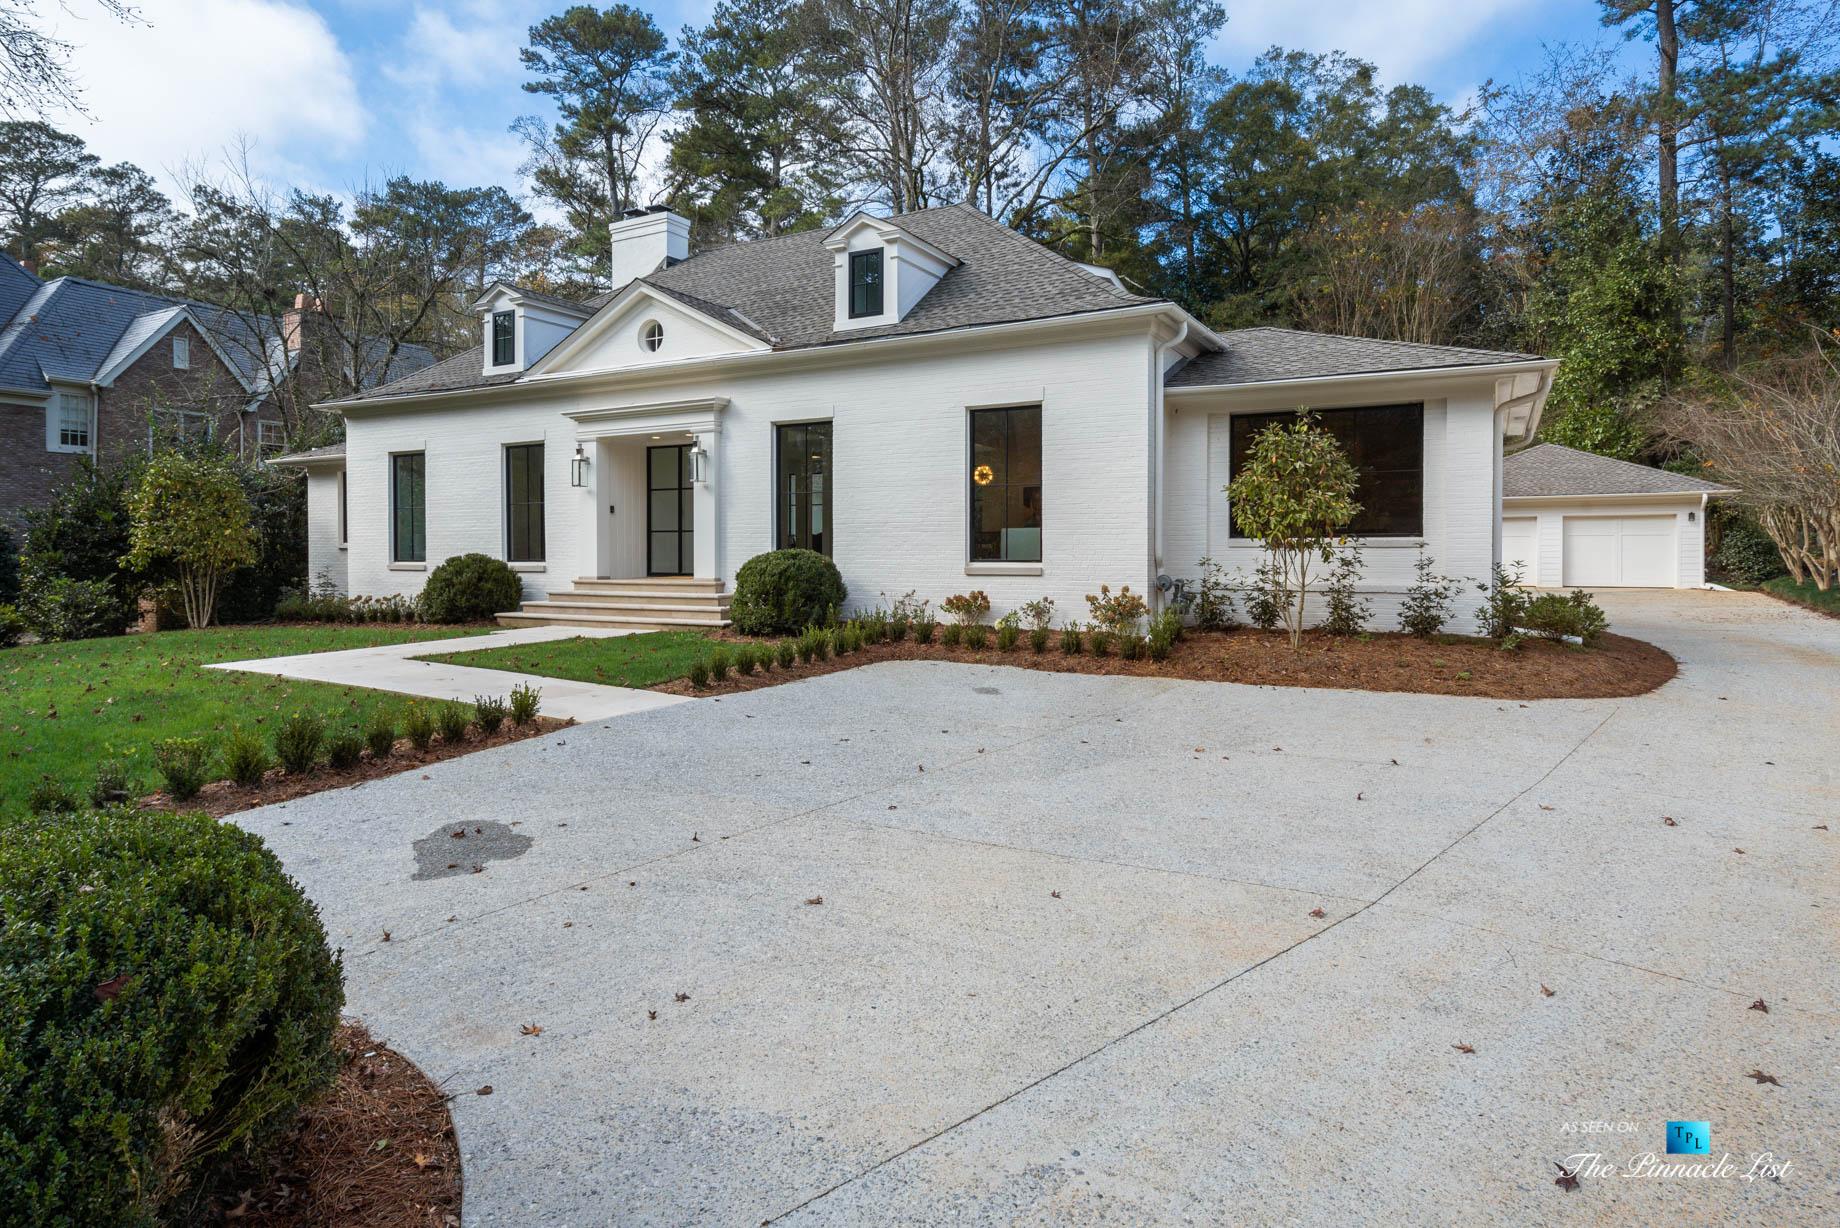 447 Valley Rd NW, Atlanta, GA, USA – Front Parking Exterior – Luxury Real Estate – Tuxedo Park Home